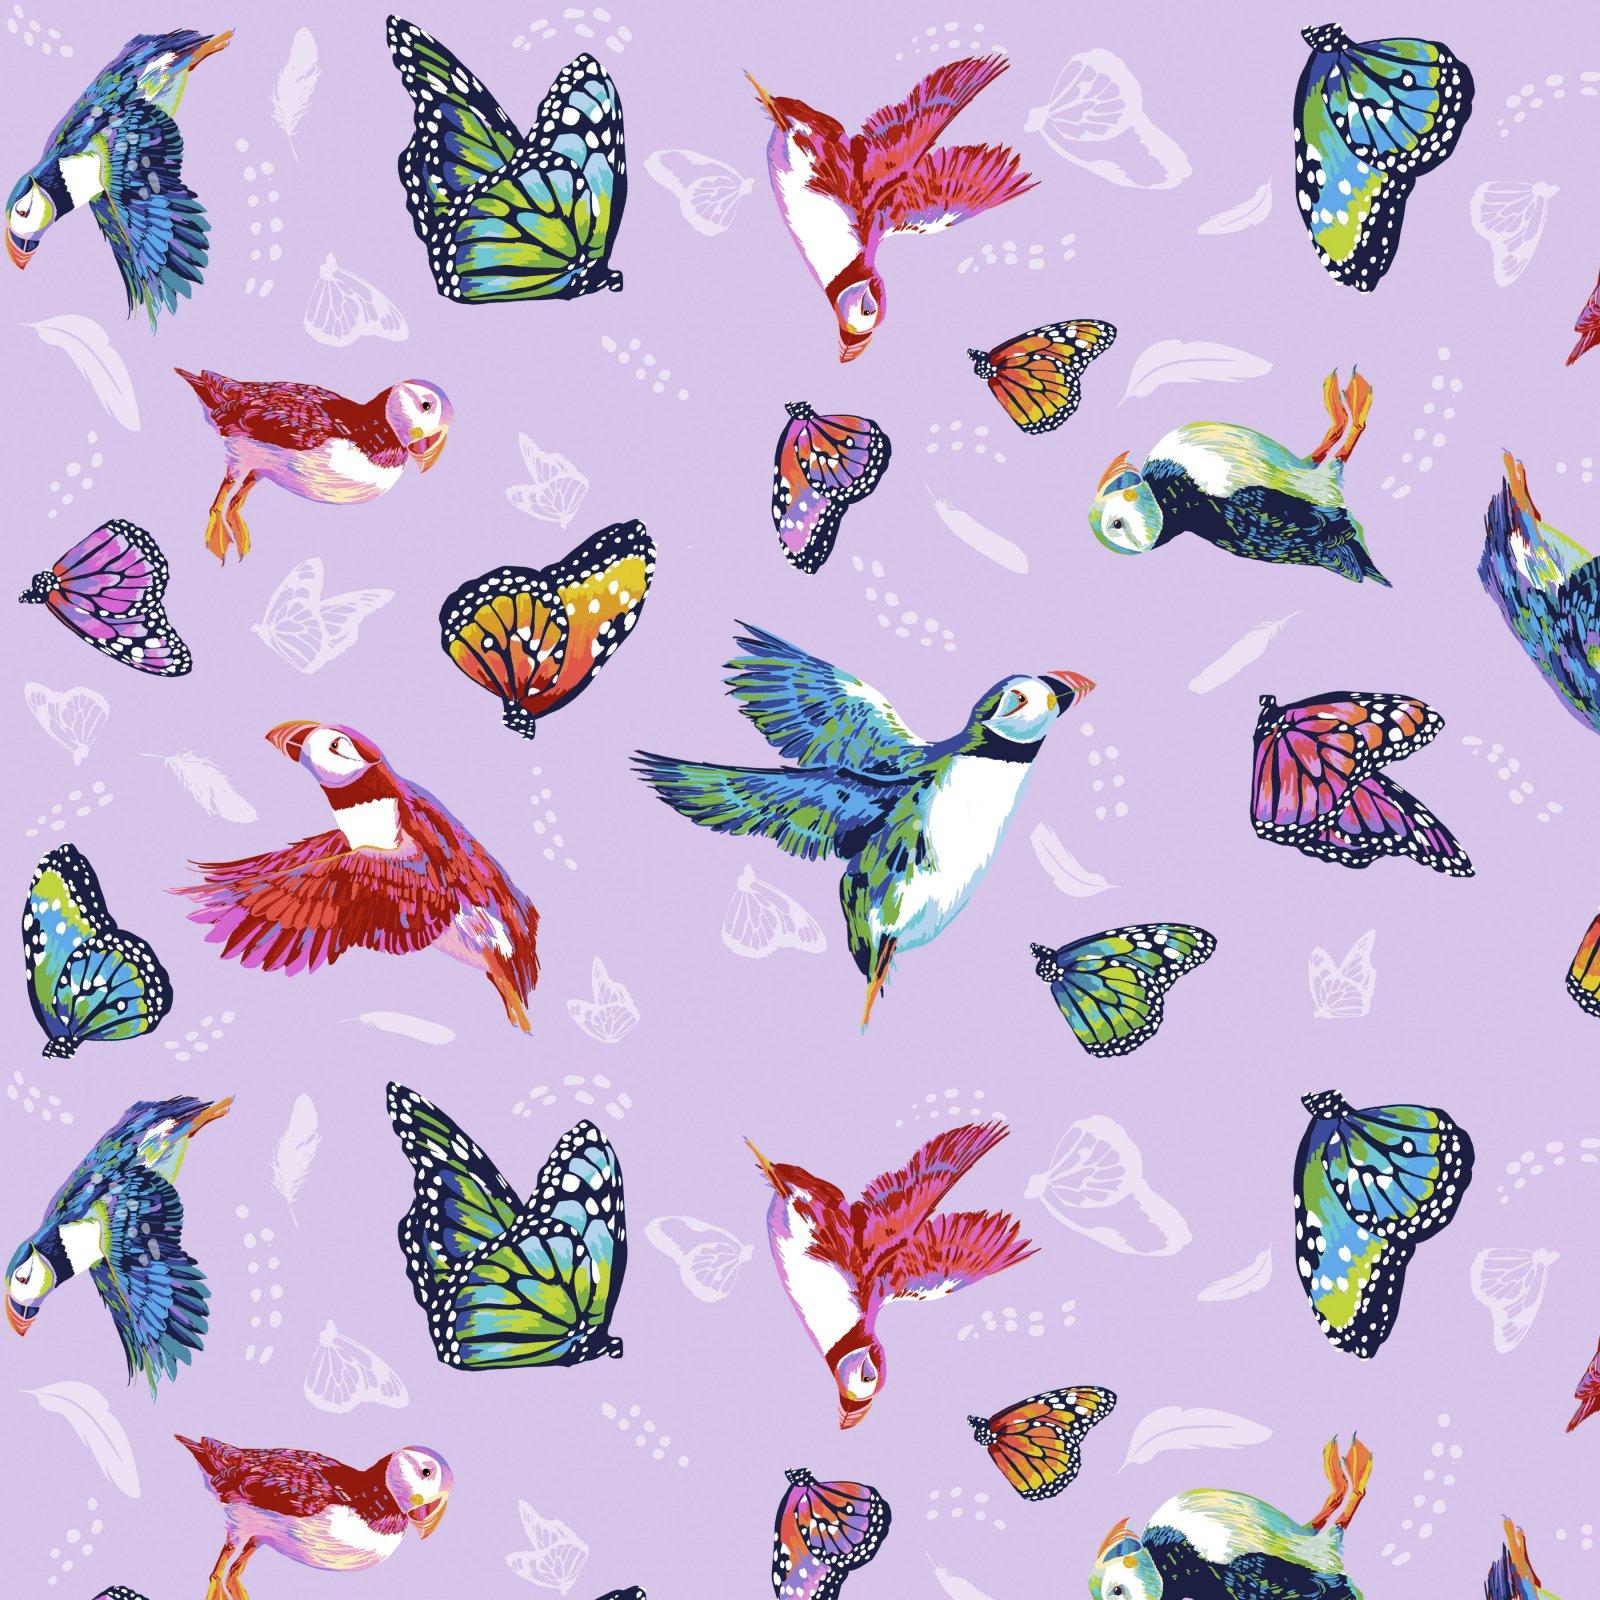 PWLT017.LAVENDER - Free Spirit Migration Friends in Flight - Lavender